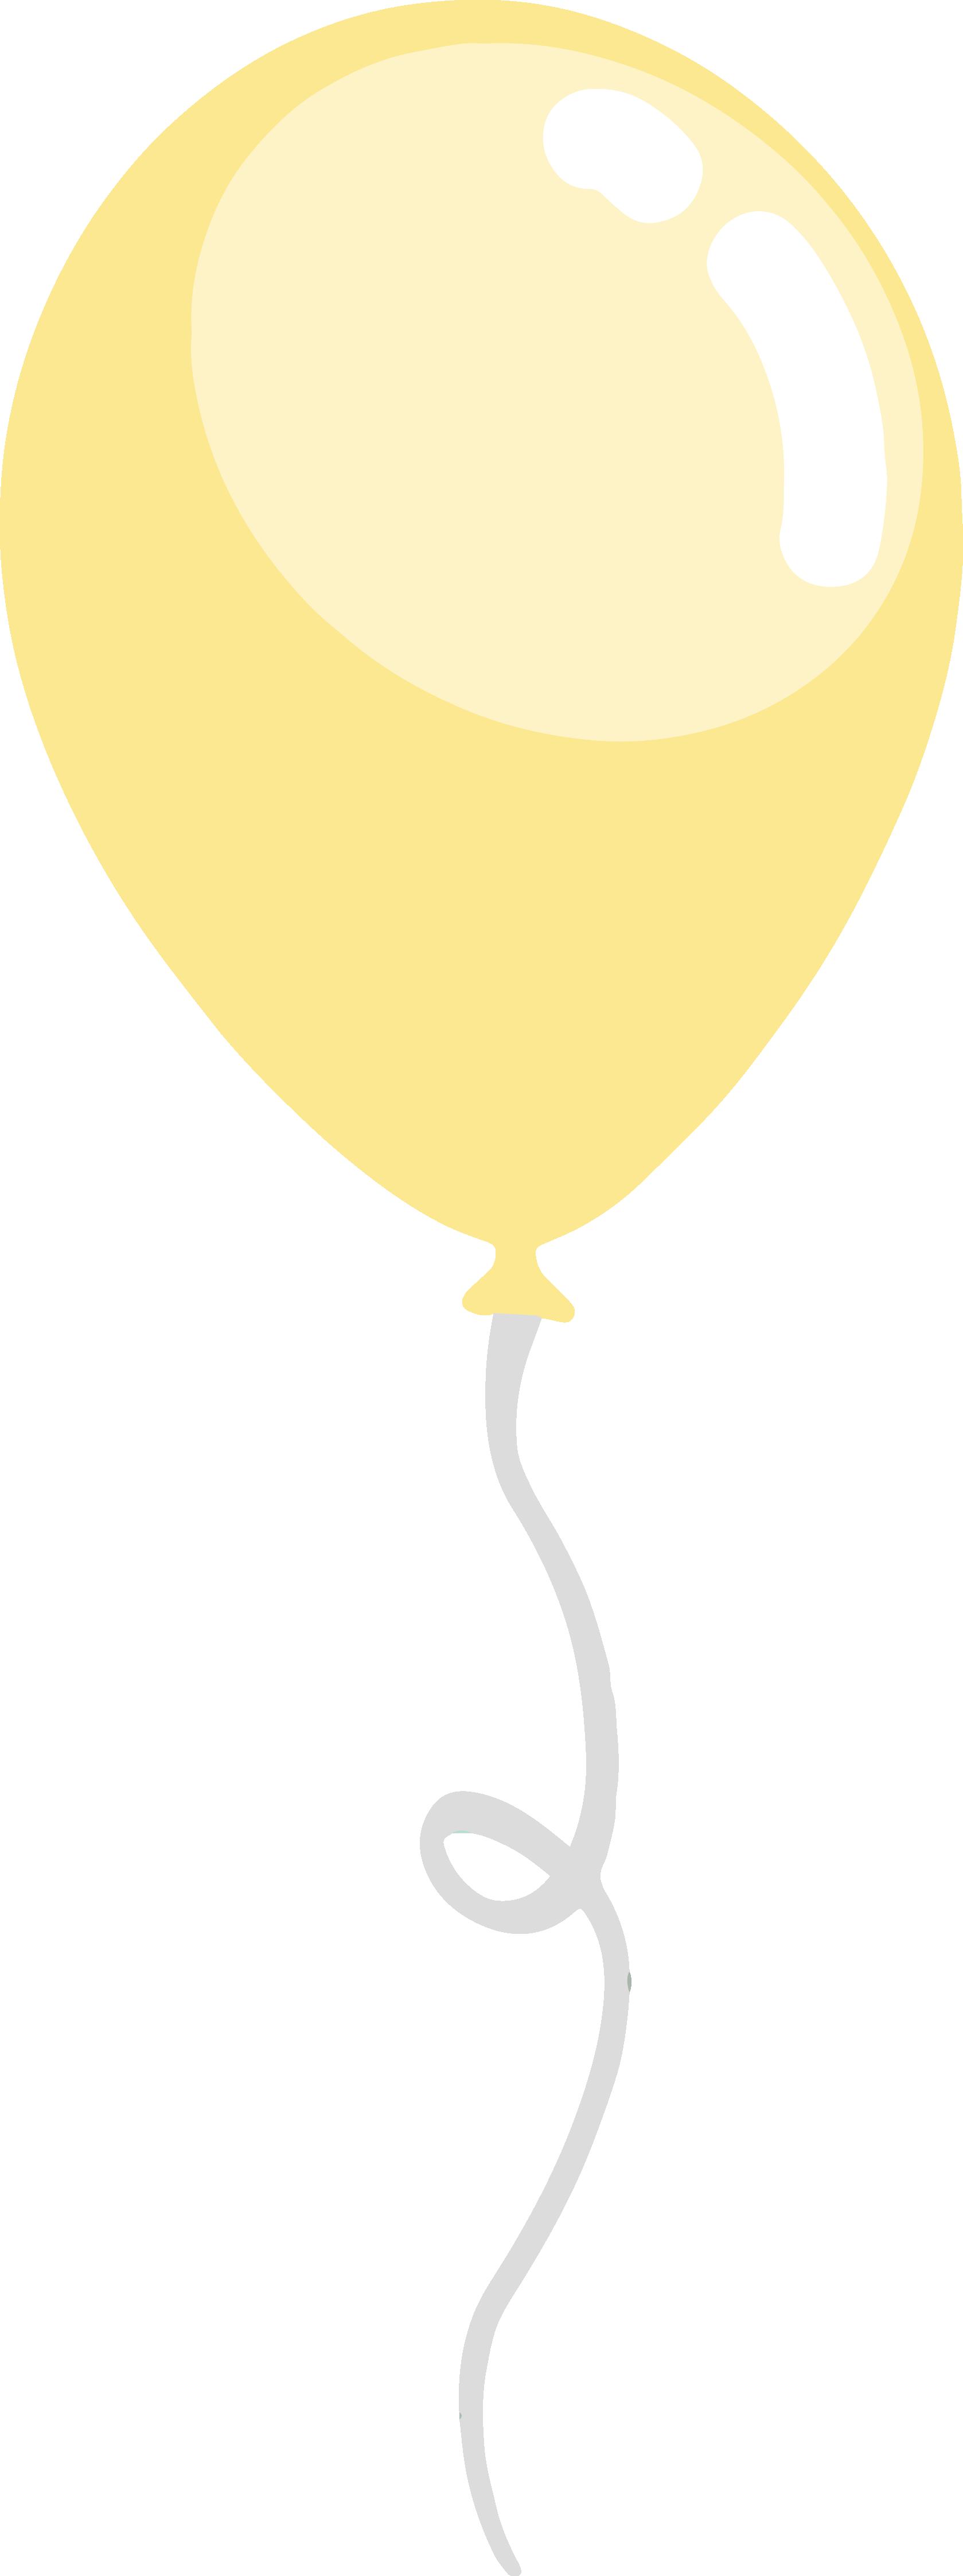 Illustration - Balloon (Yellow).png